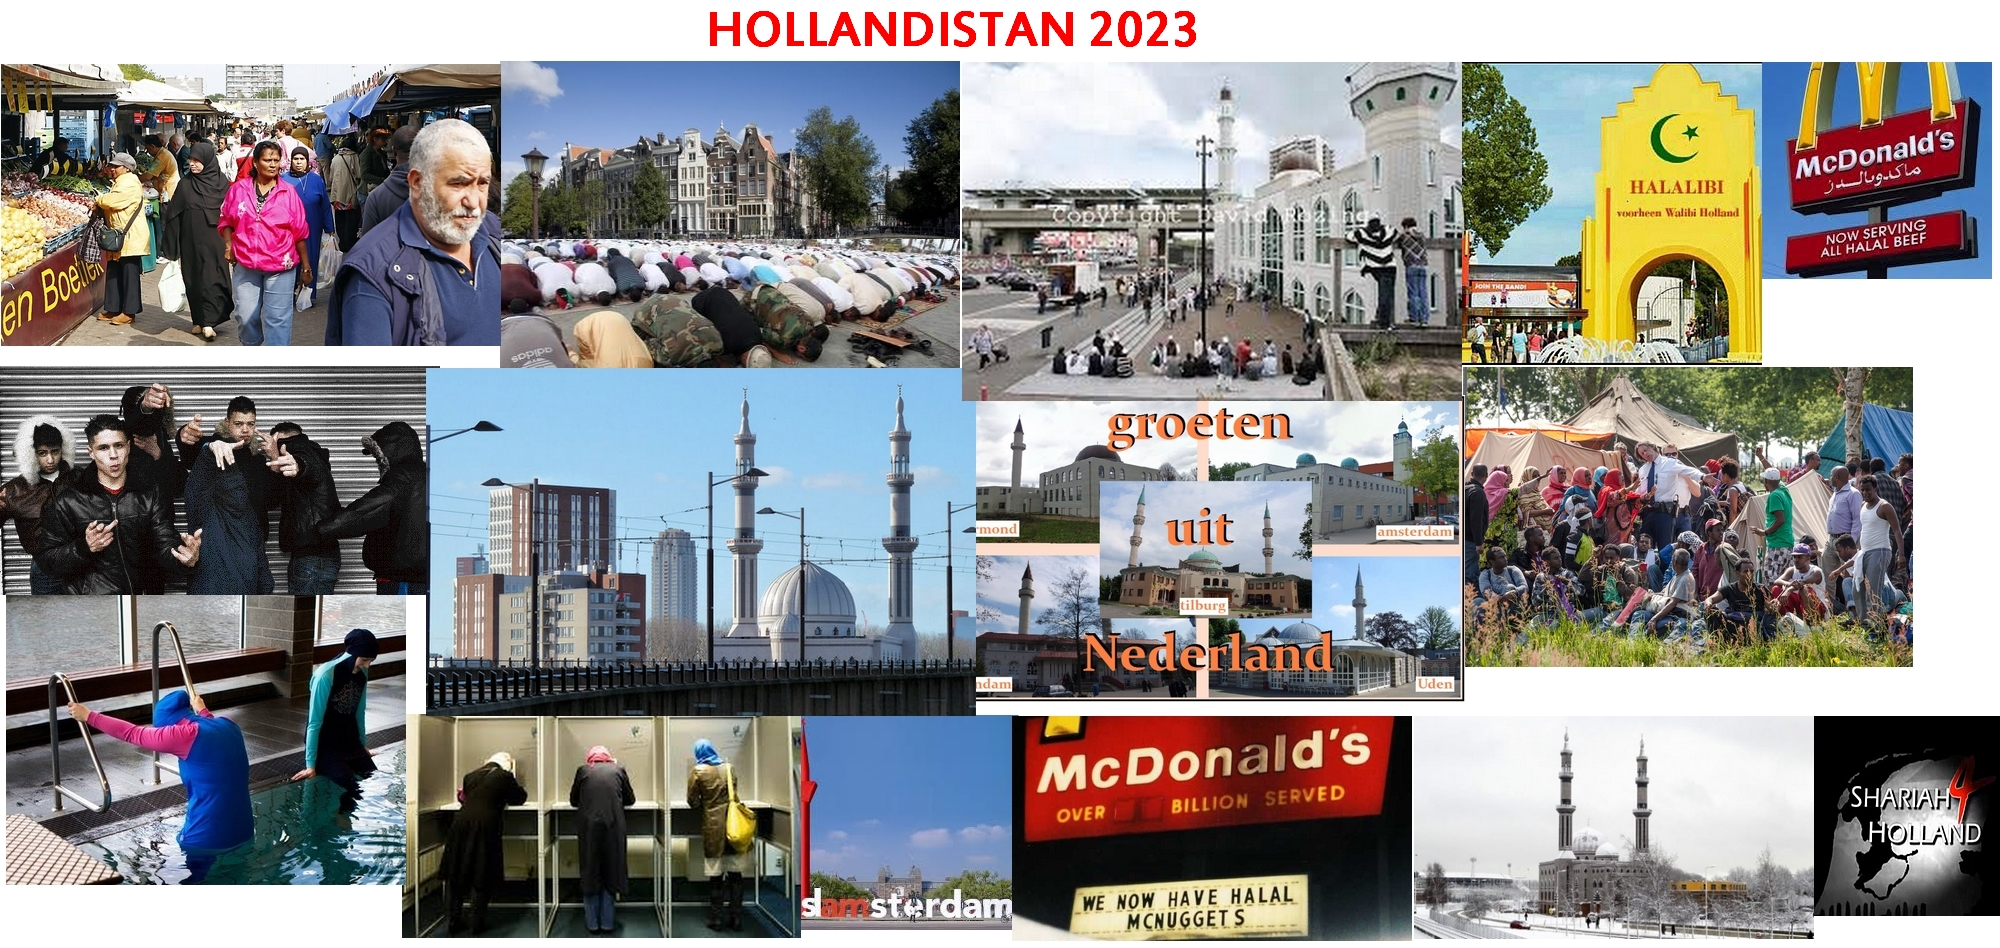 [img width=1024 height=485]https://eunmask.files.wordpress.com/2013/11/hollandistan.jpg[/img]